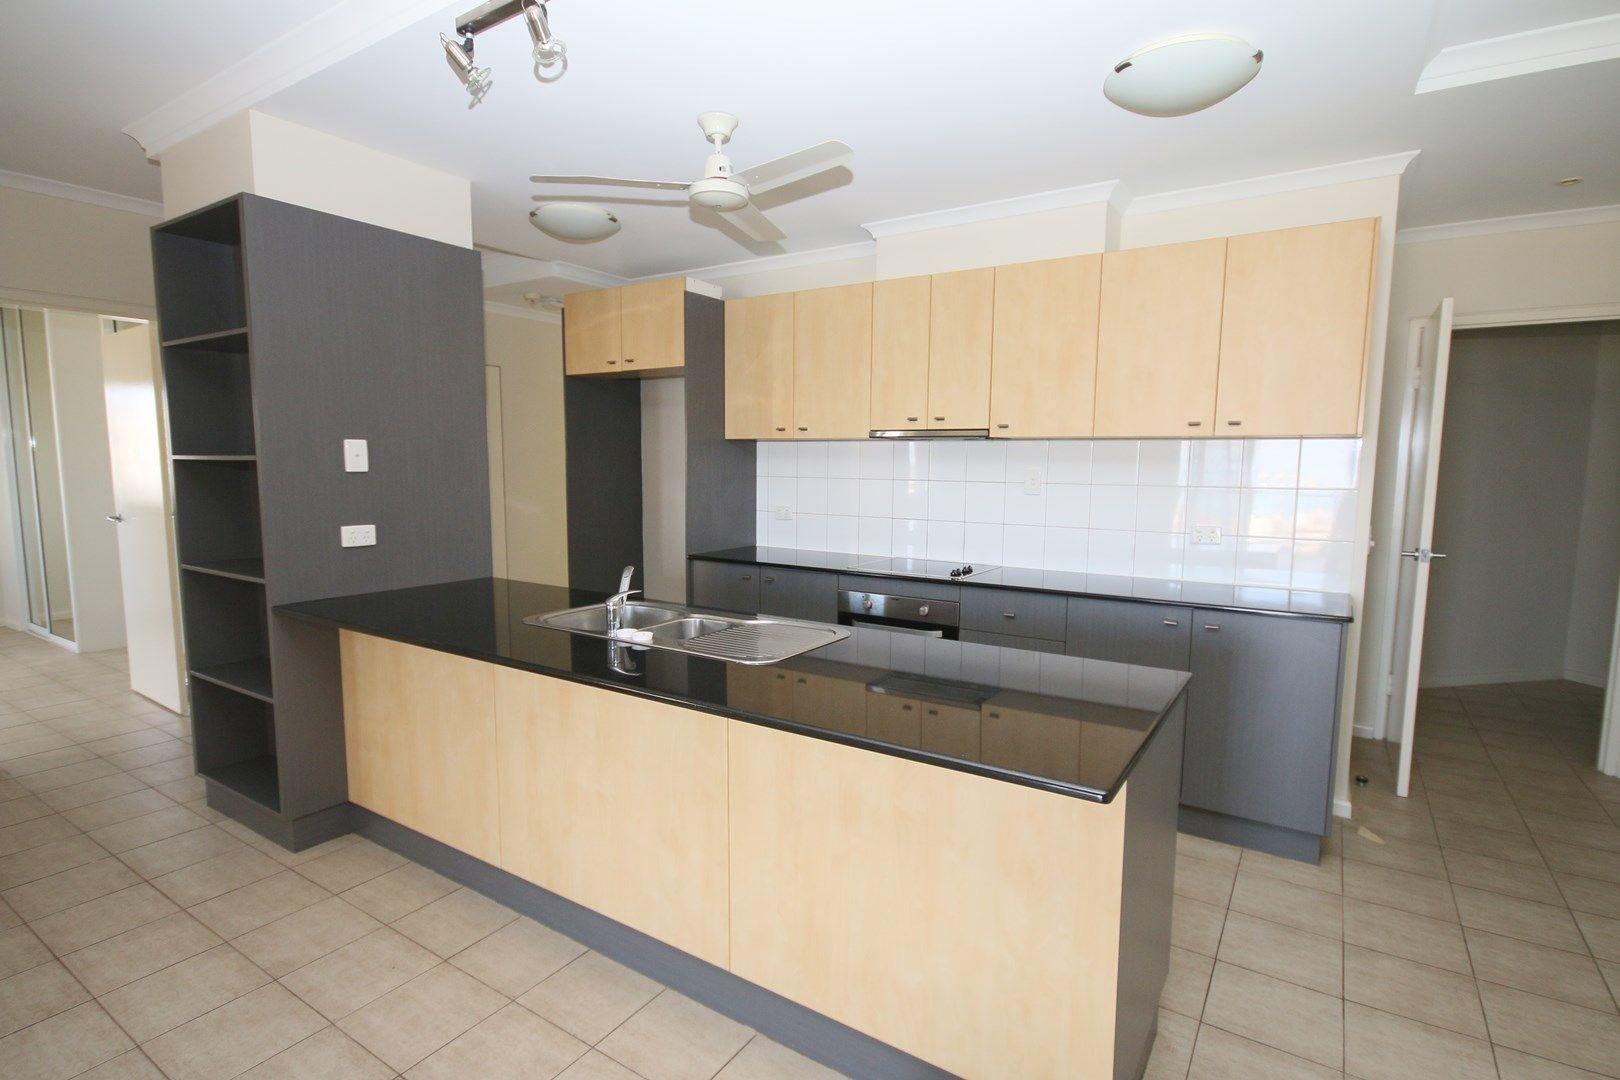 3 bedrooms Apartment / Unit / Flat in 55/9 Carey Street DARWIN CITY NT, 0800